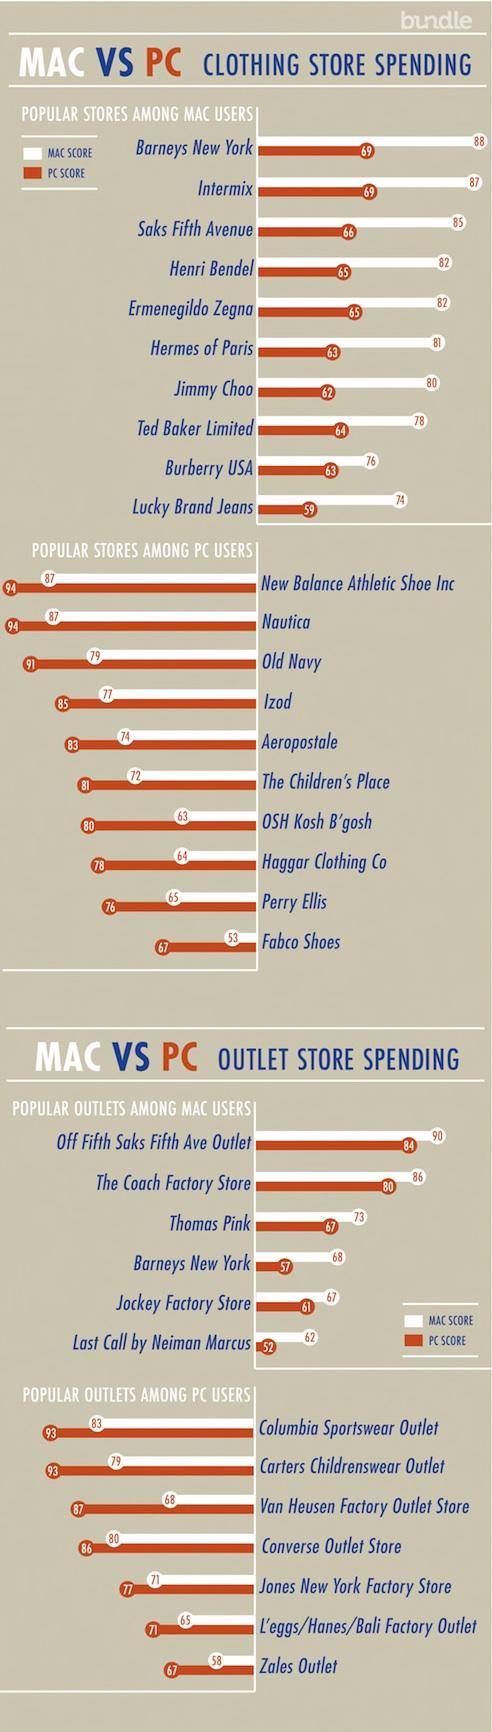 Mac VS PC chart